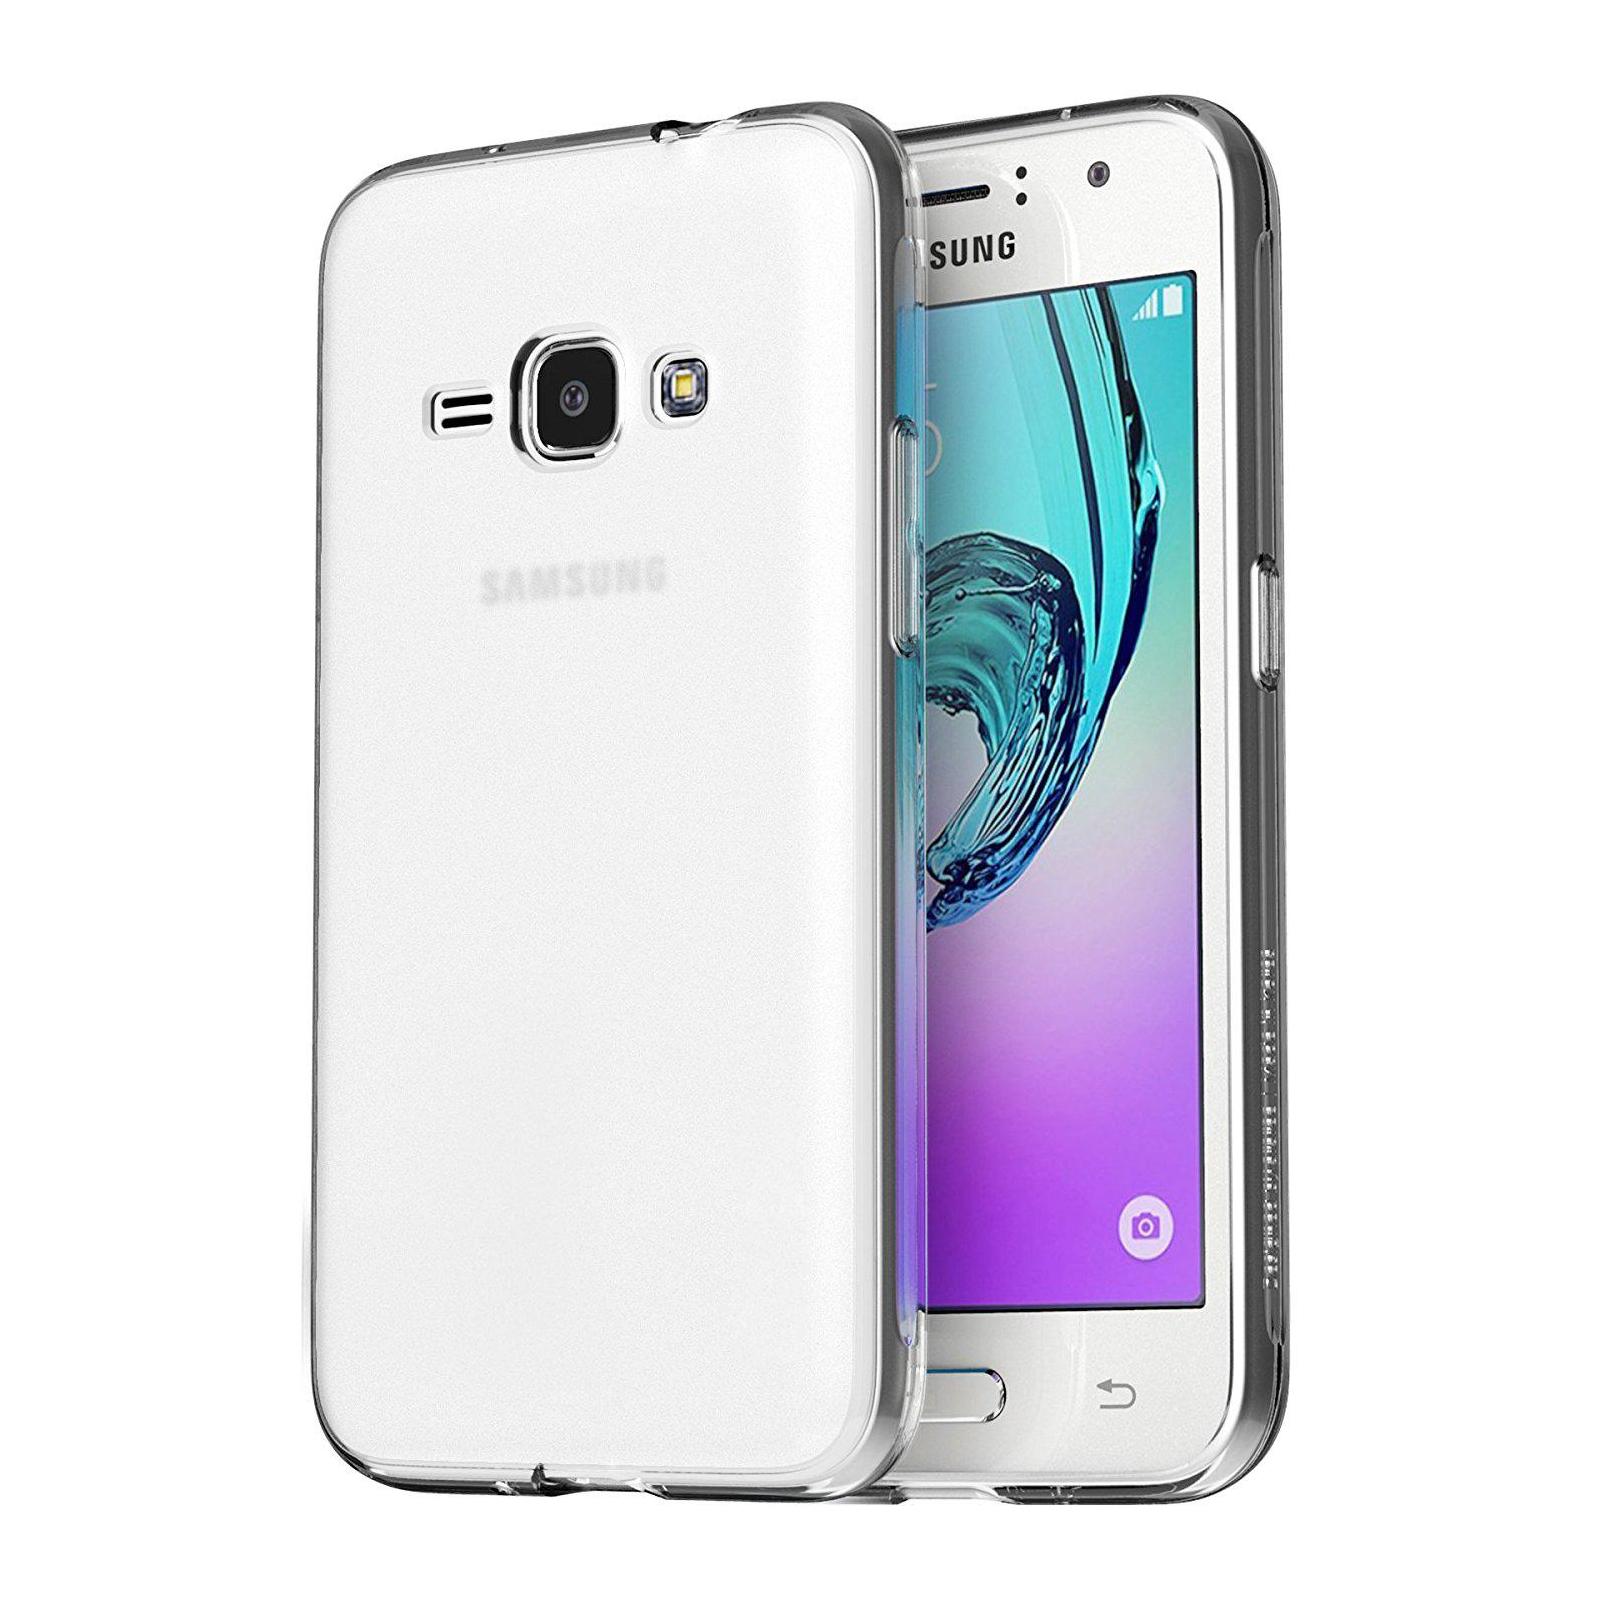 Чехол для моб. телефона SmartCase Samsung Galaxy J3 /J320 TPU Clear (SC-J320)